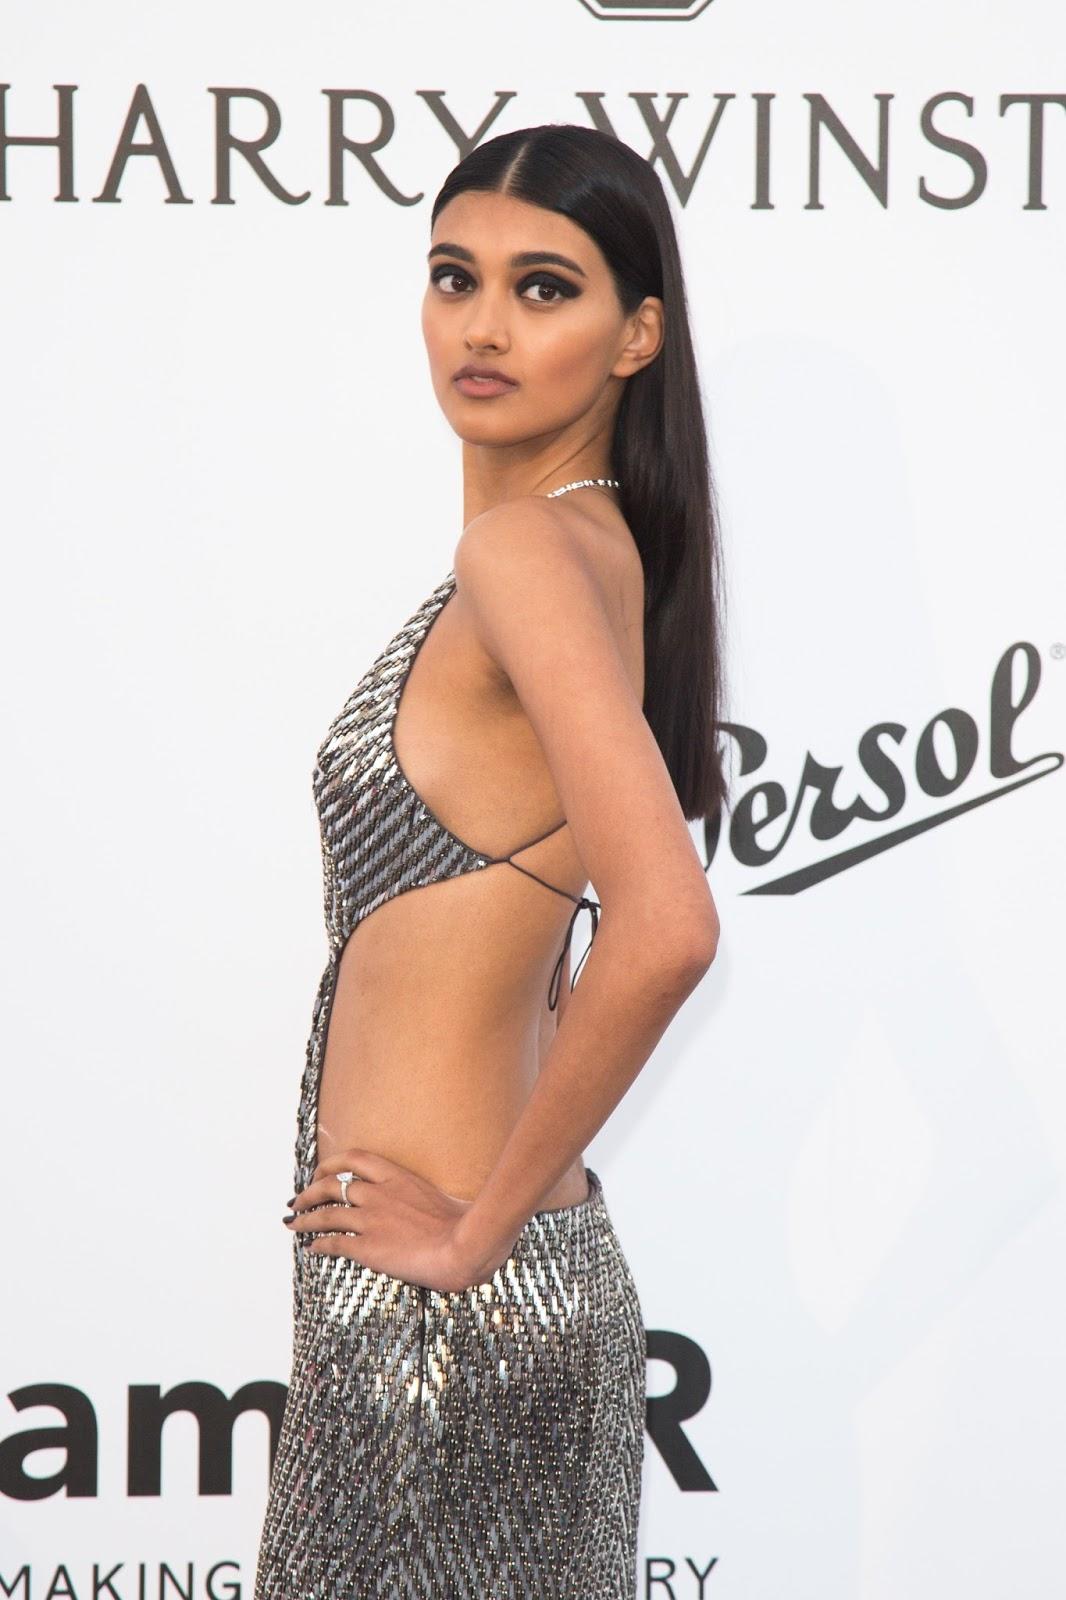 Hot Neelam Gill nude photos 2019